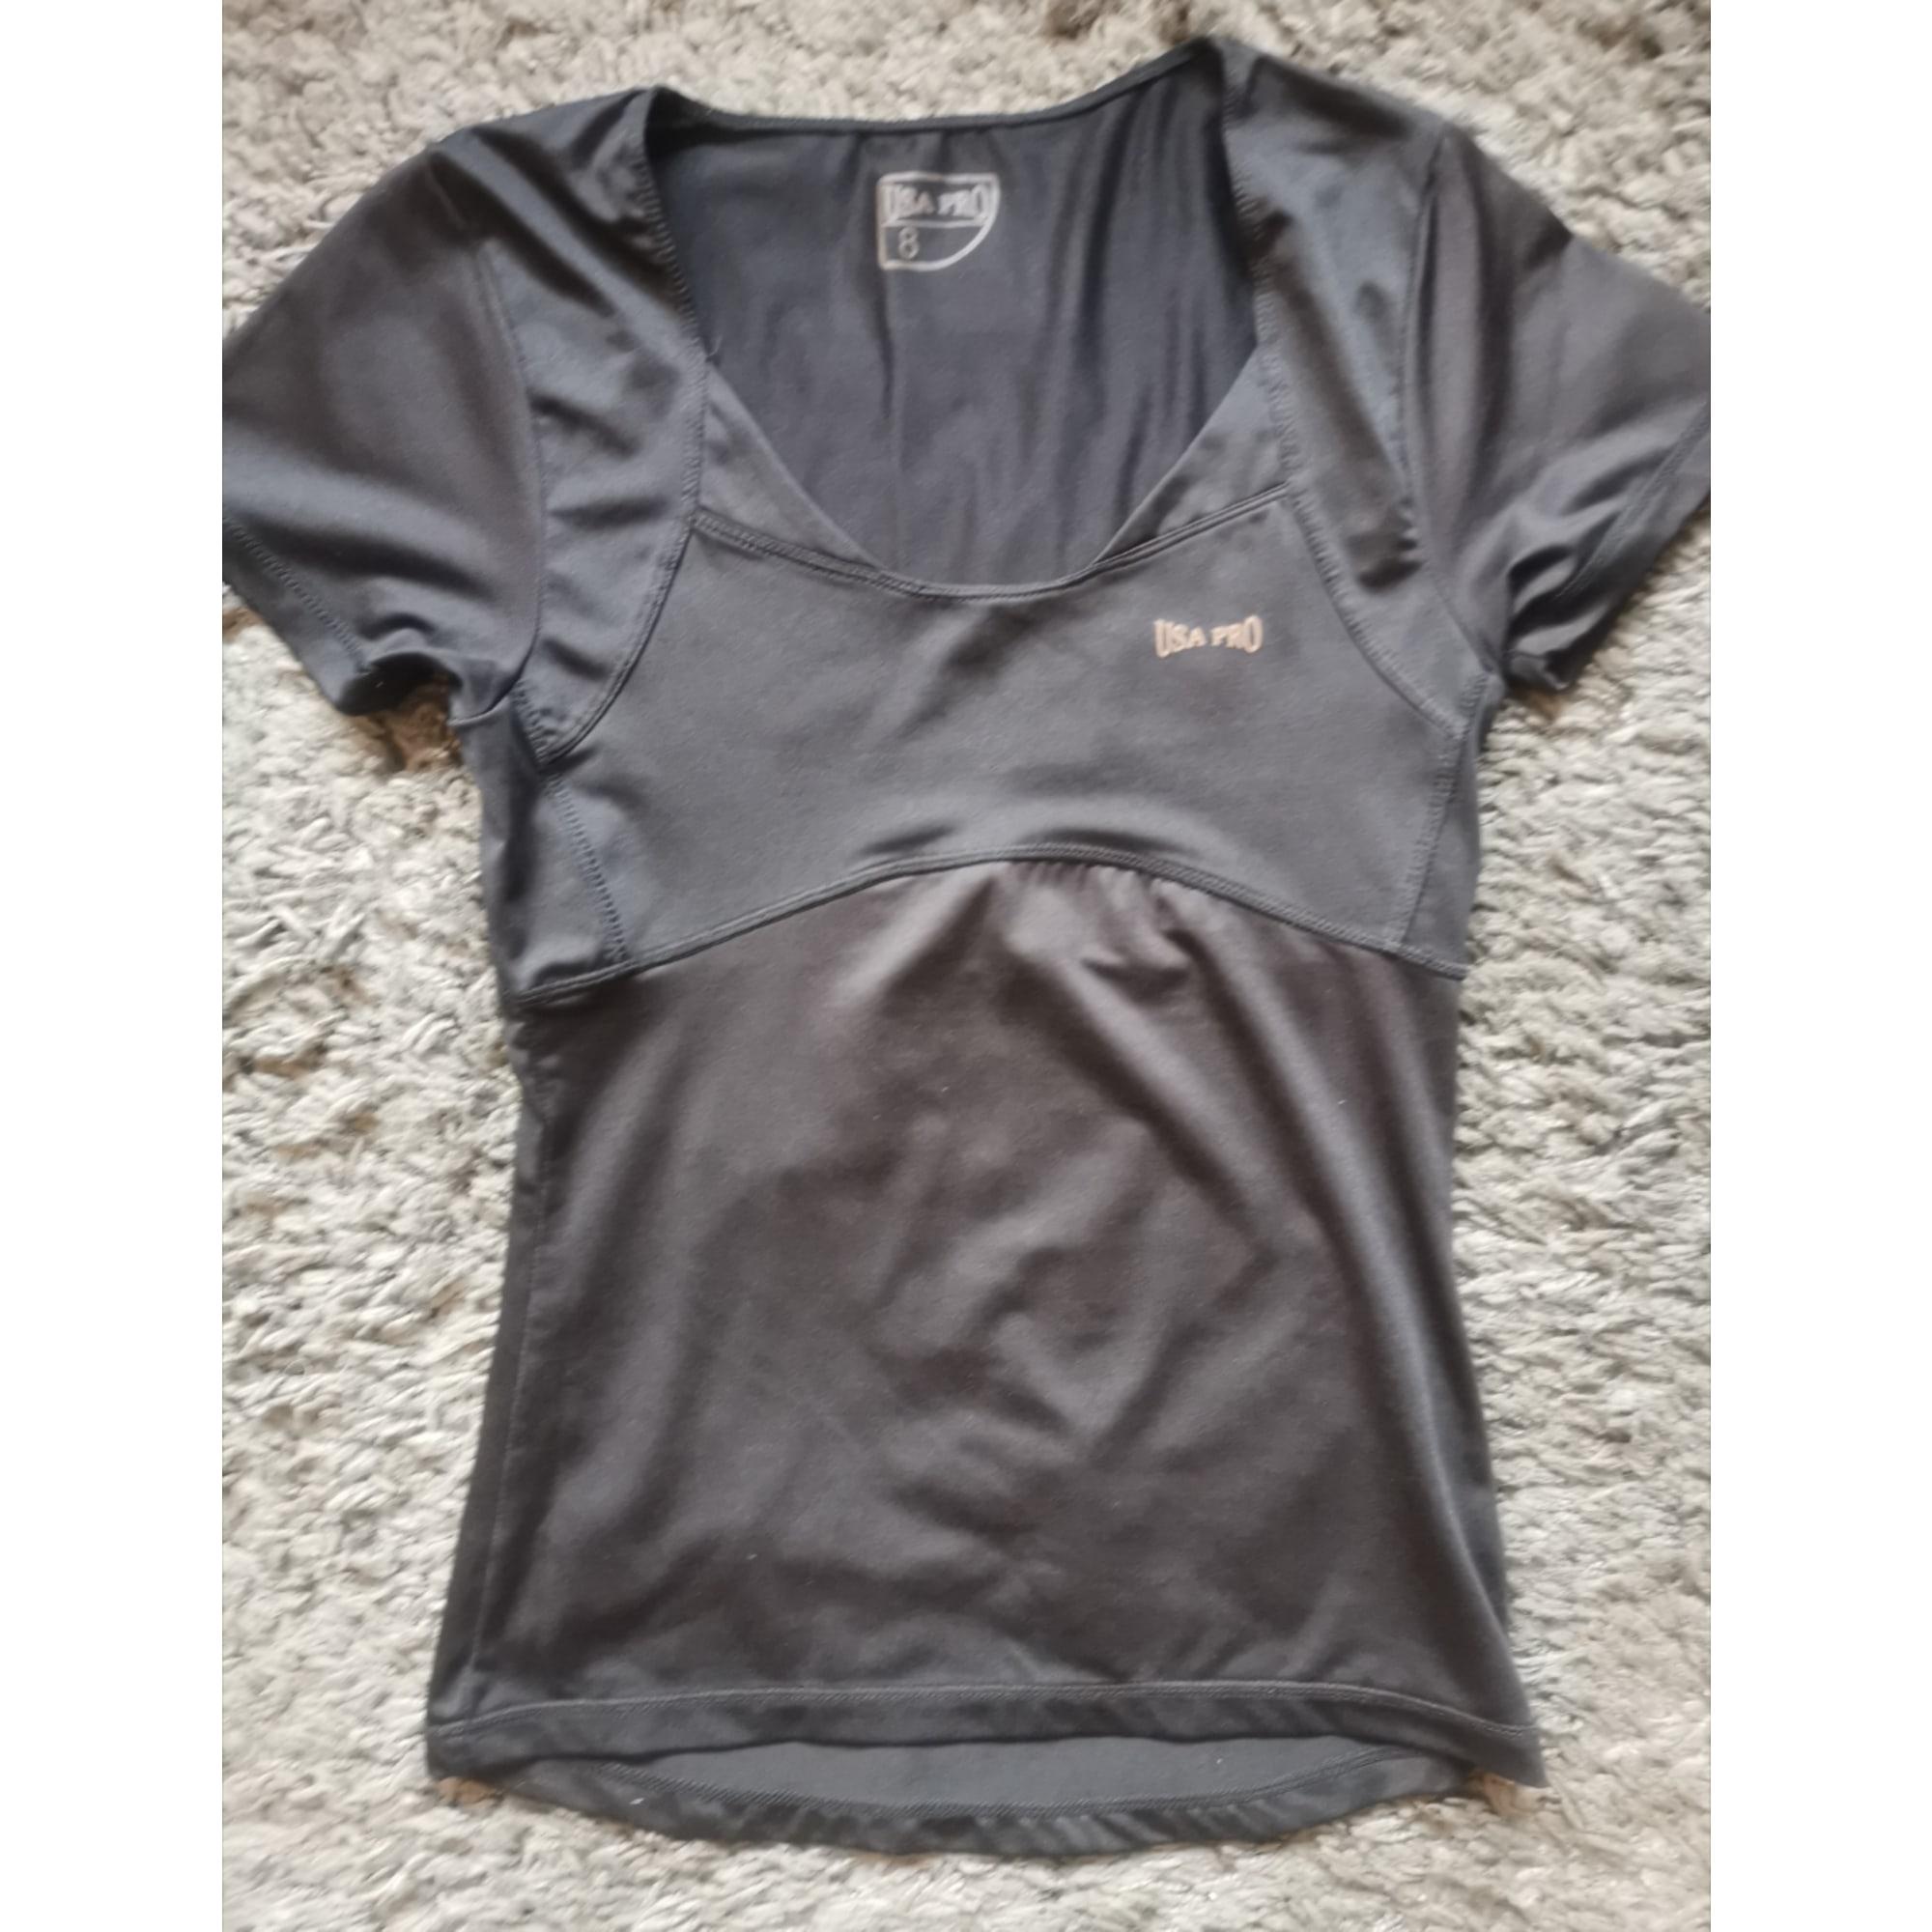 Top, tee-shirt USA PRO Noir